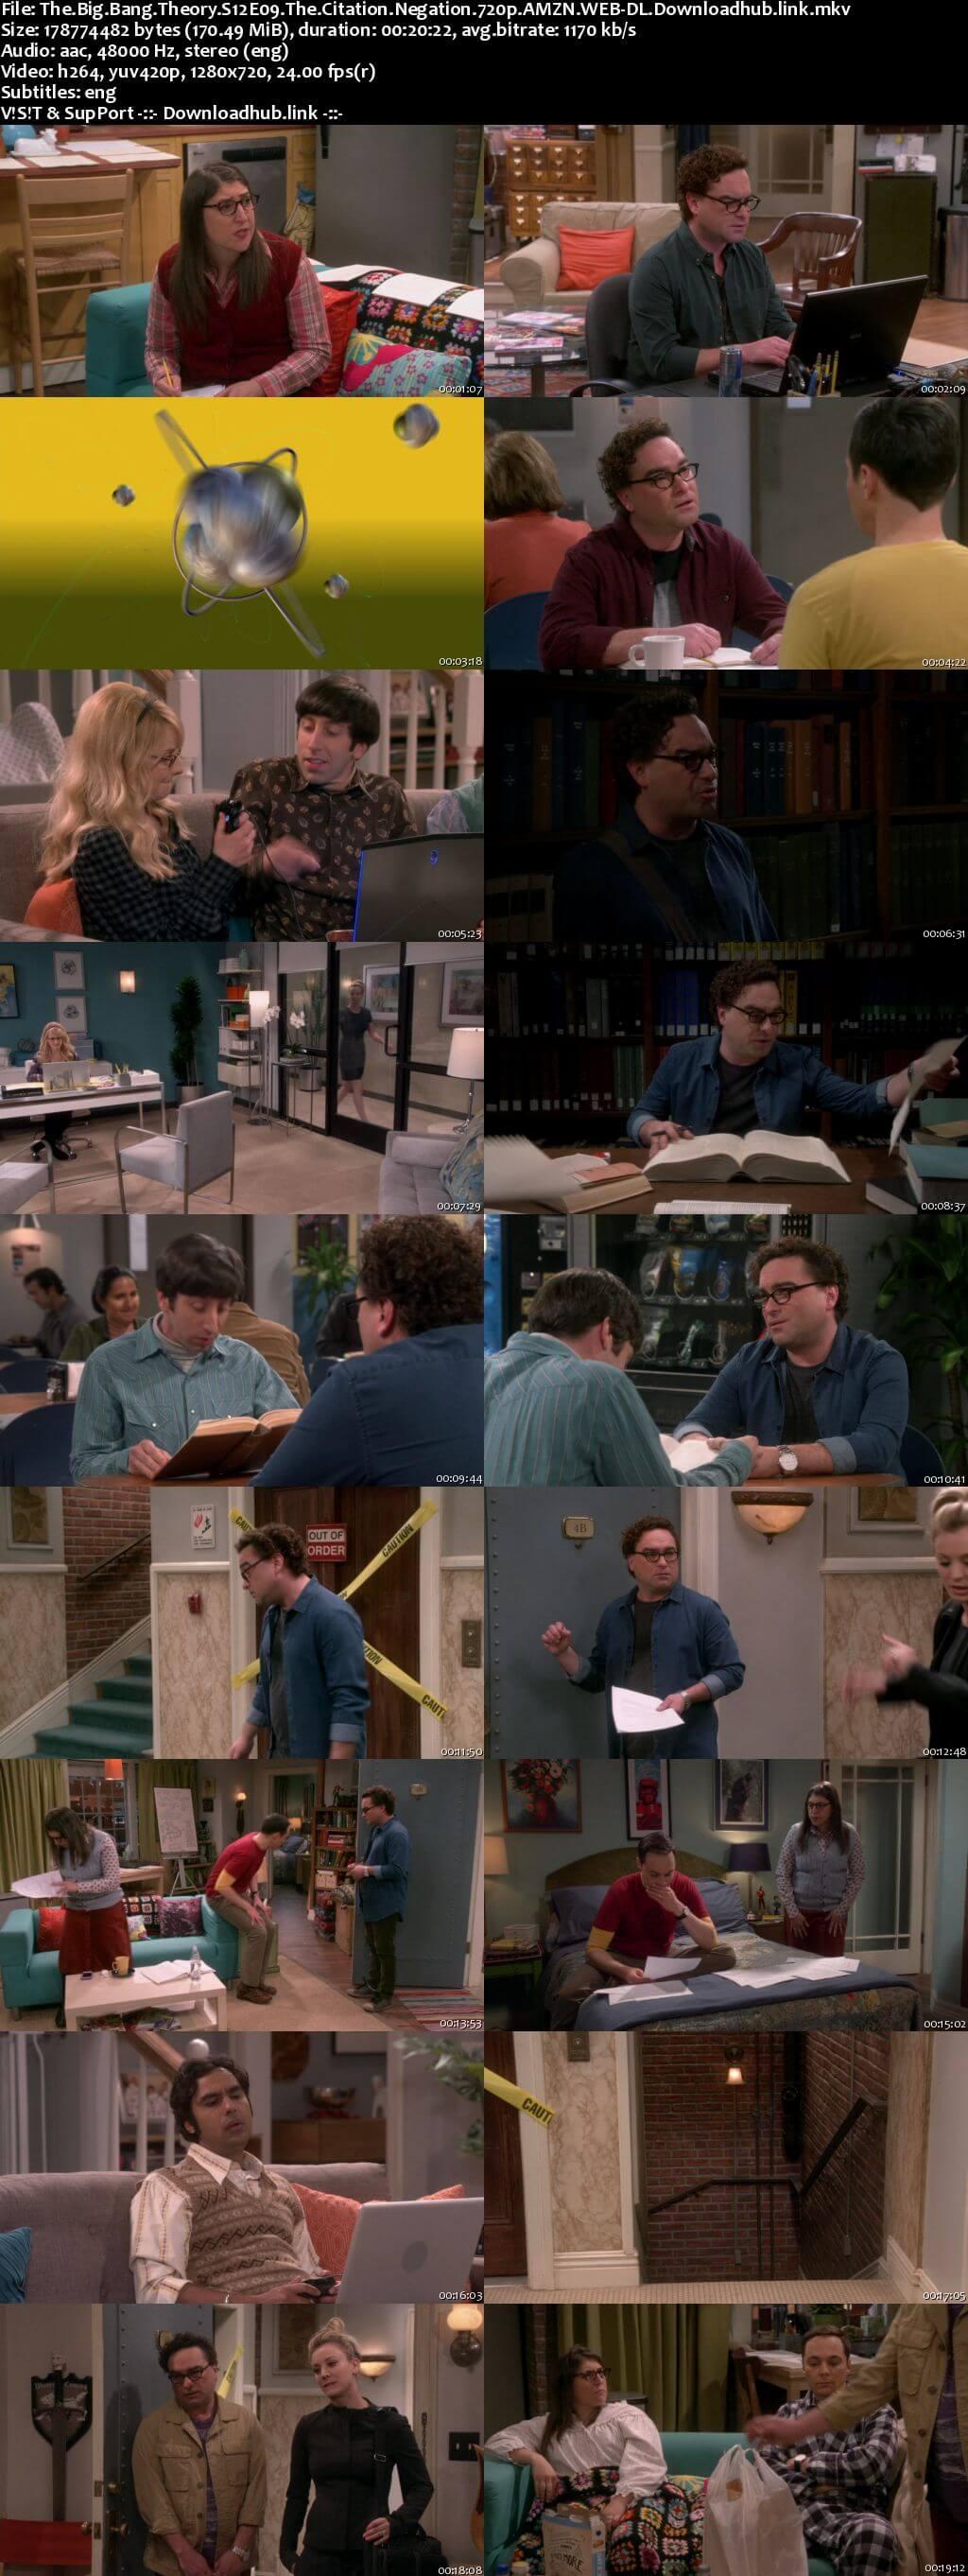 The Big Bang Theory S12E09 170MB AMZN WEB-DL 720p ESubs